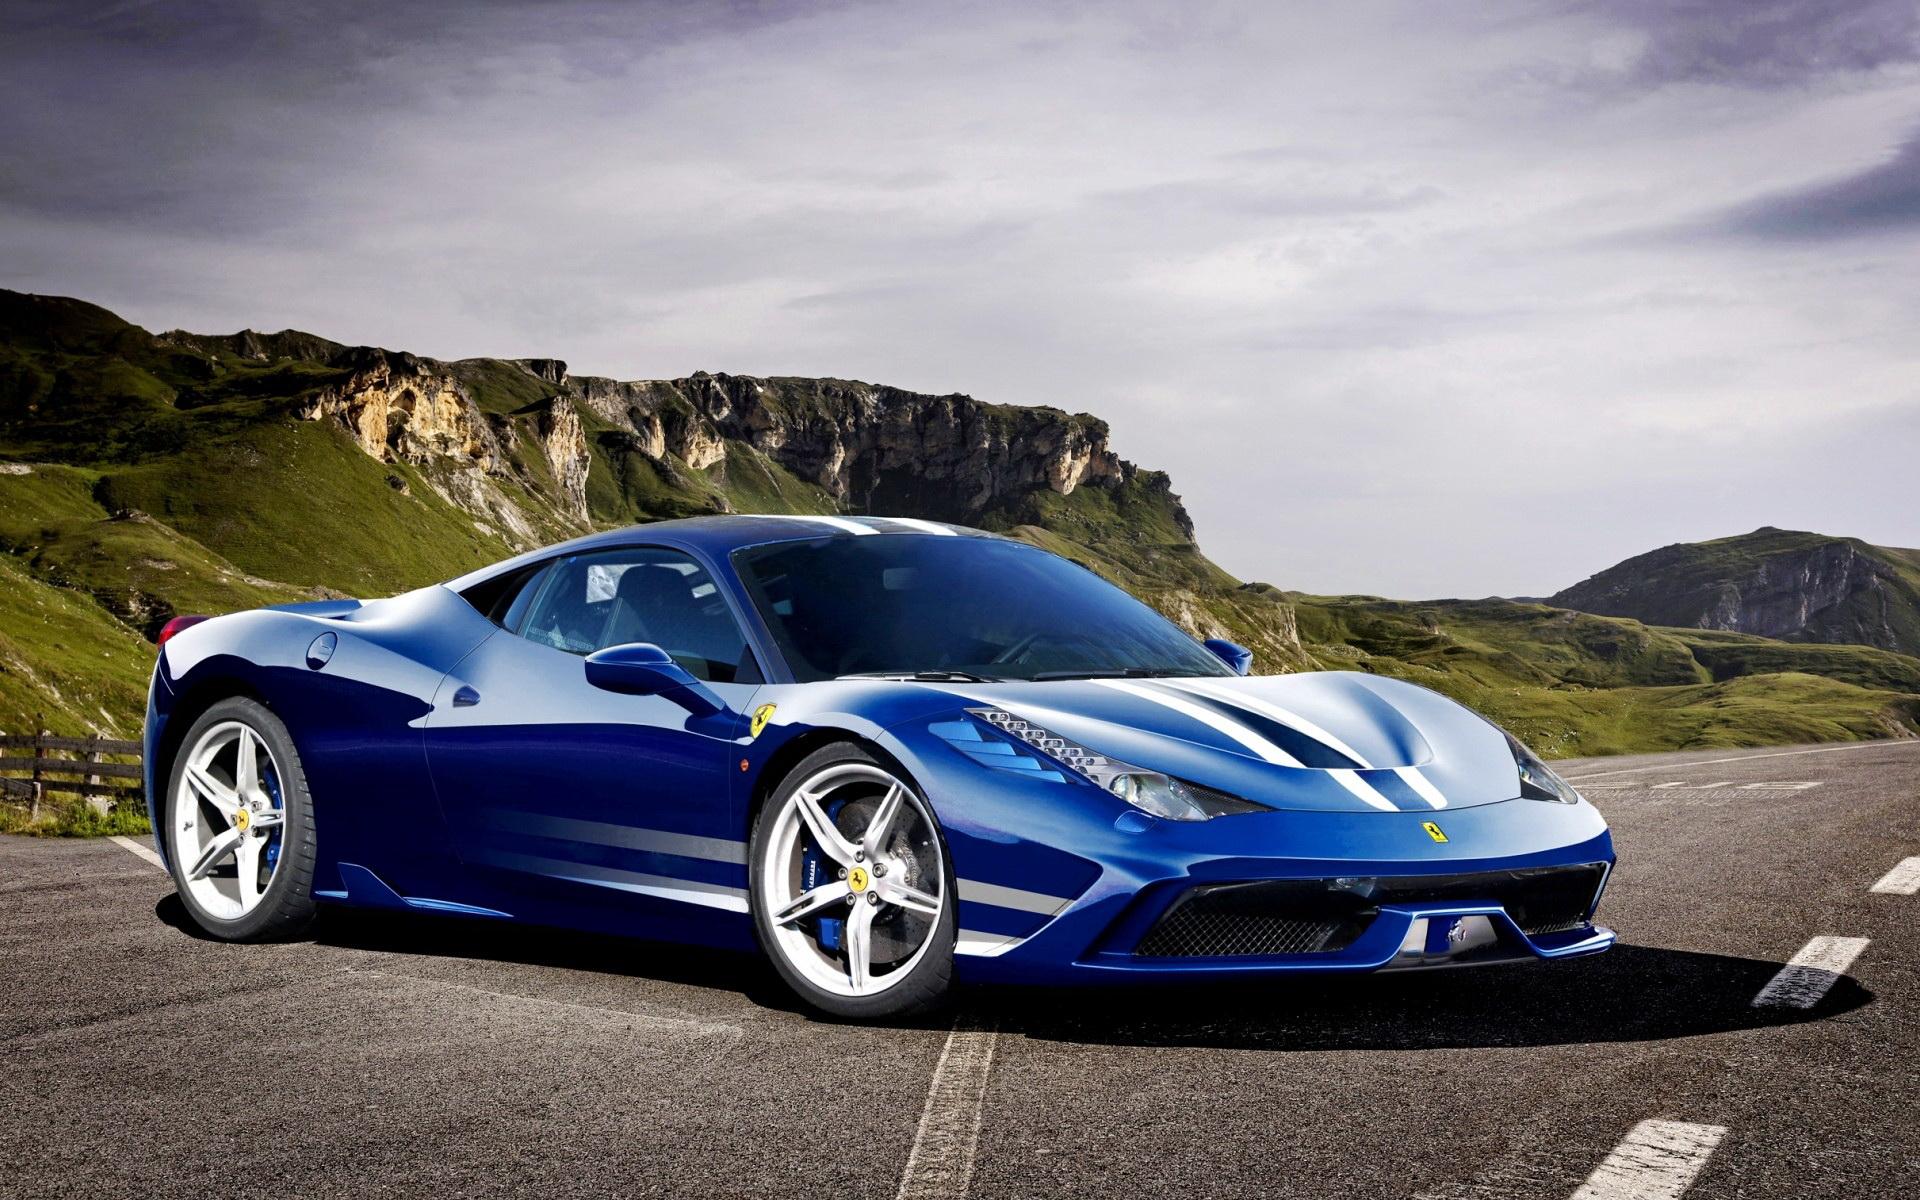 Fondos De Vehiculos: Ferrari Fondos De Pantalla, Fondos De Escritorio